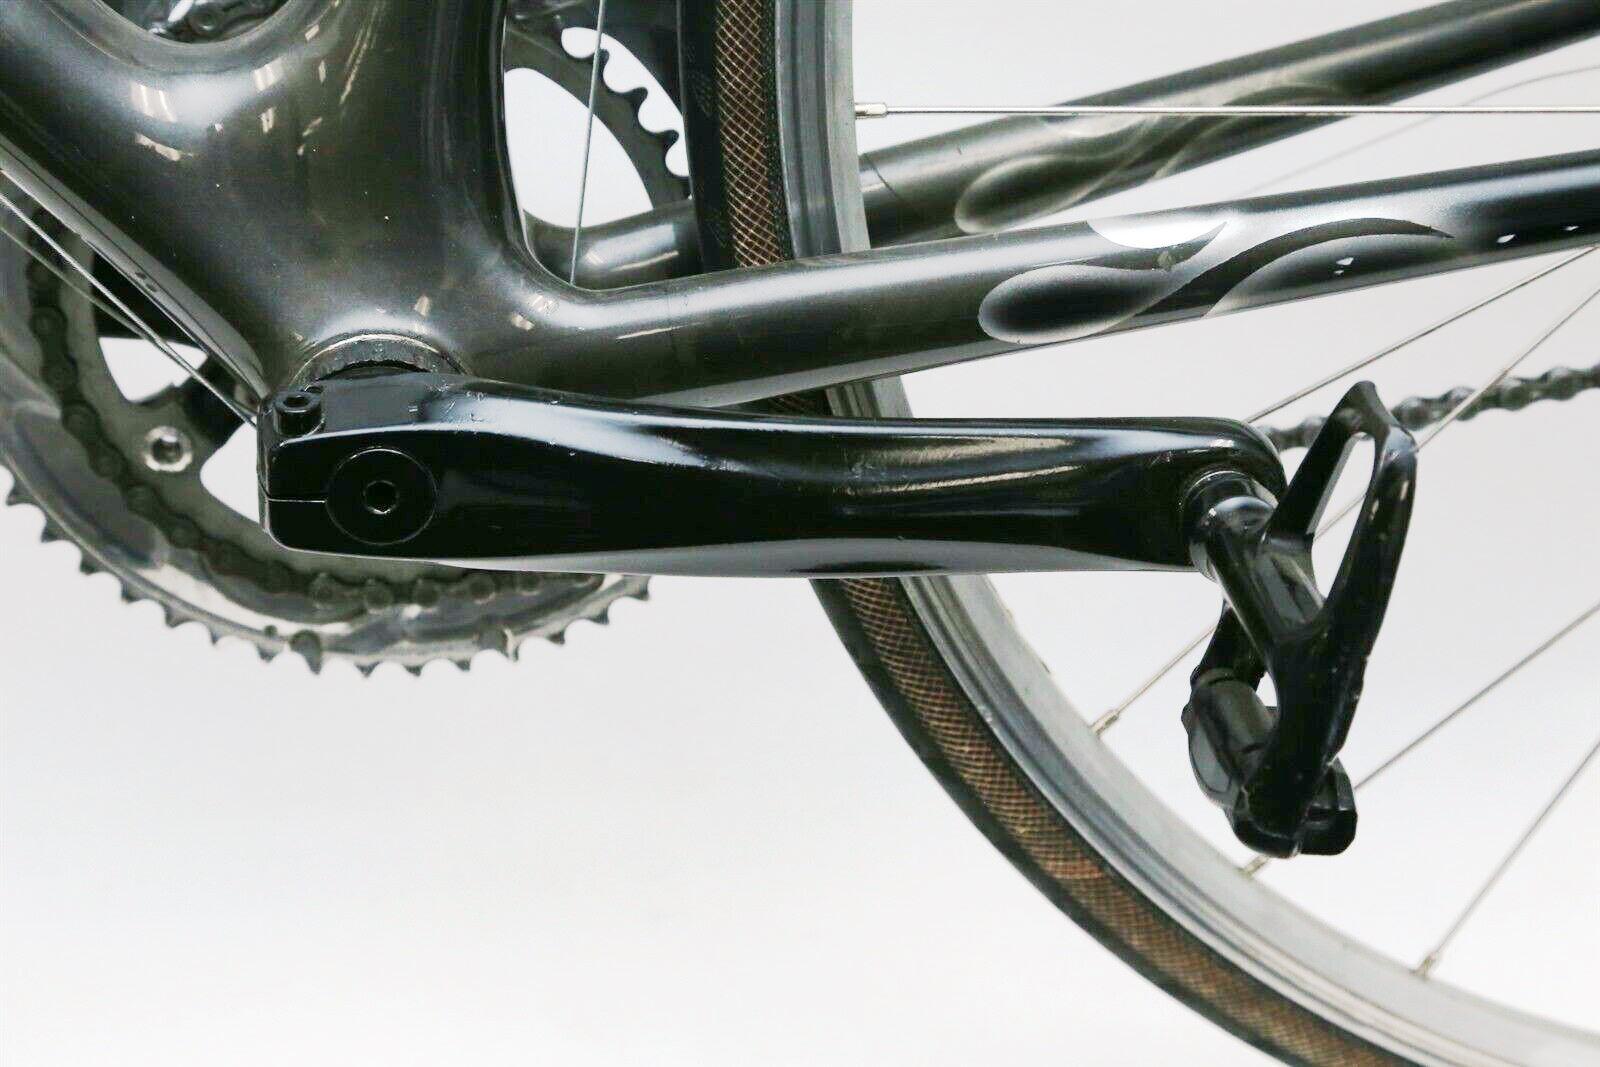 d6b6cdeeb0b Trek Madone SL - Project One - OCLV110 carbon - 60cm - Houston Bike ...